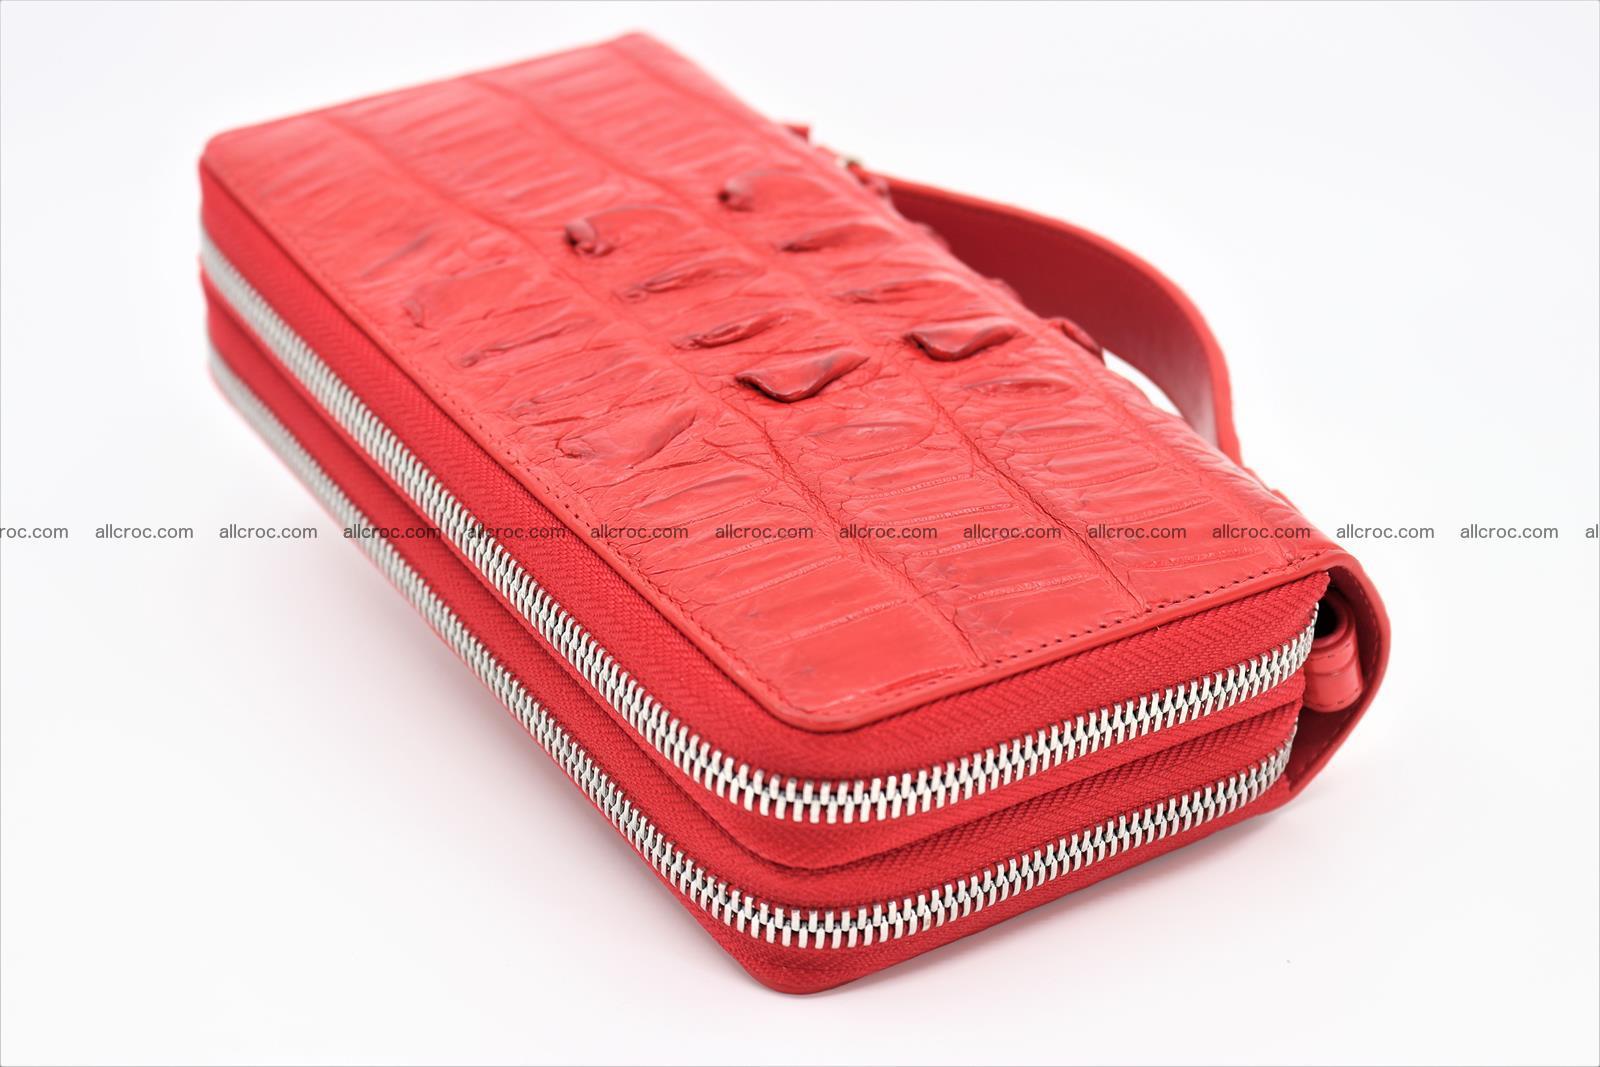 Crocodile skin clutch red color 2 zips 1263 Foto 1